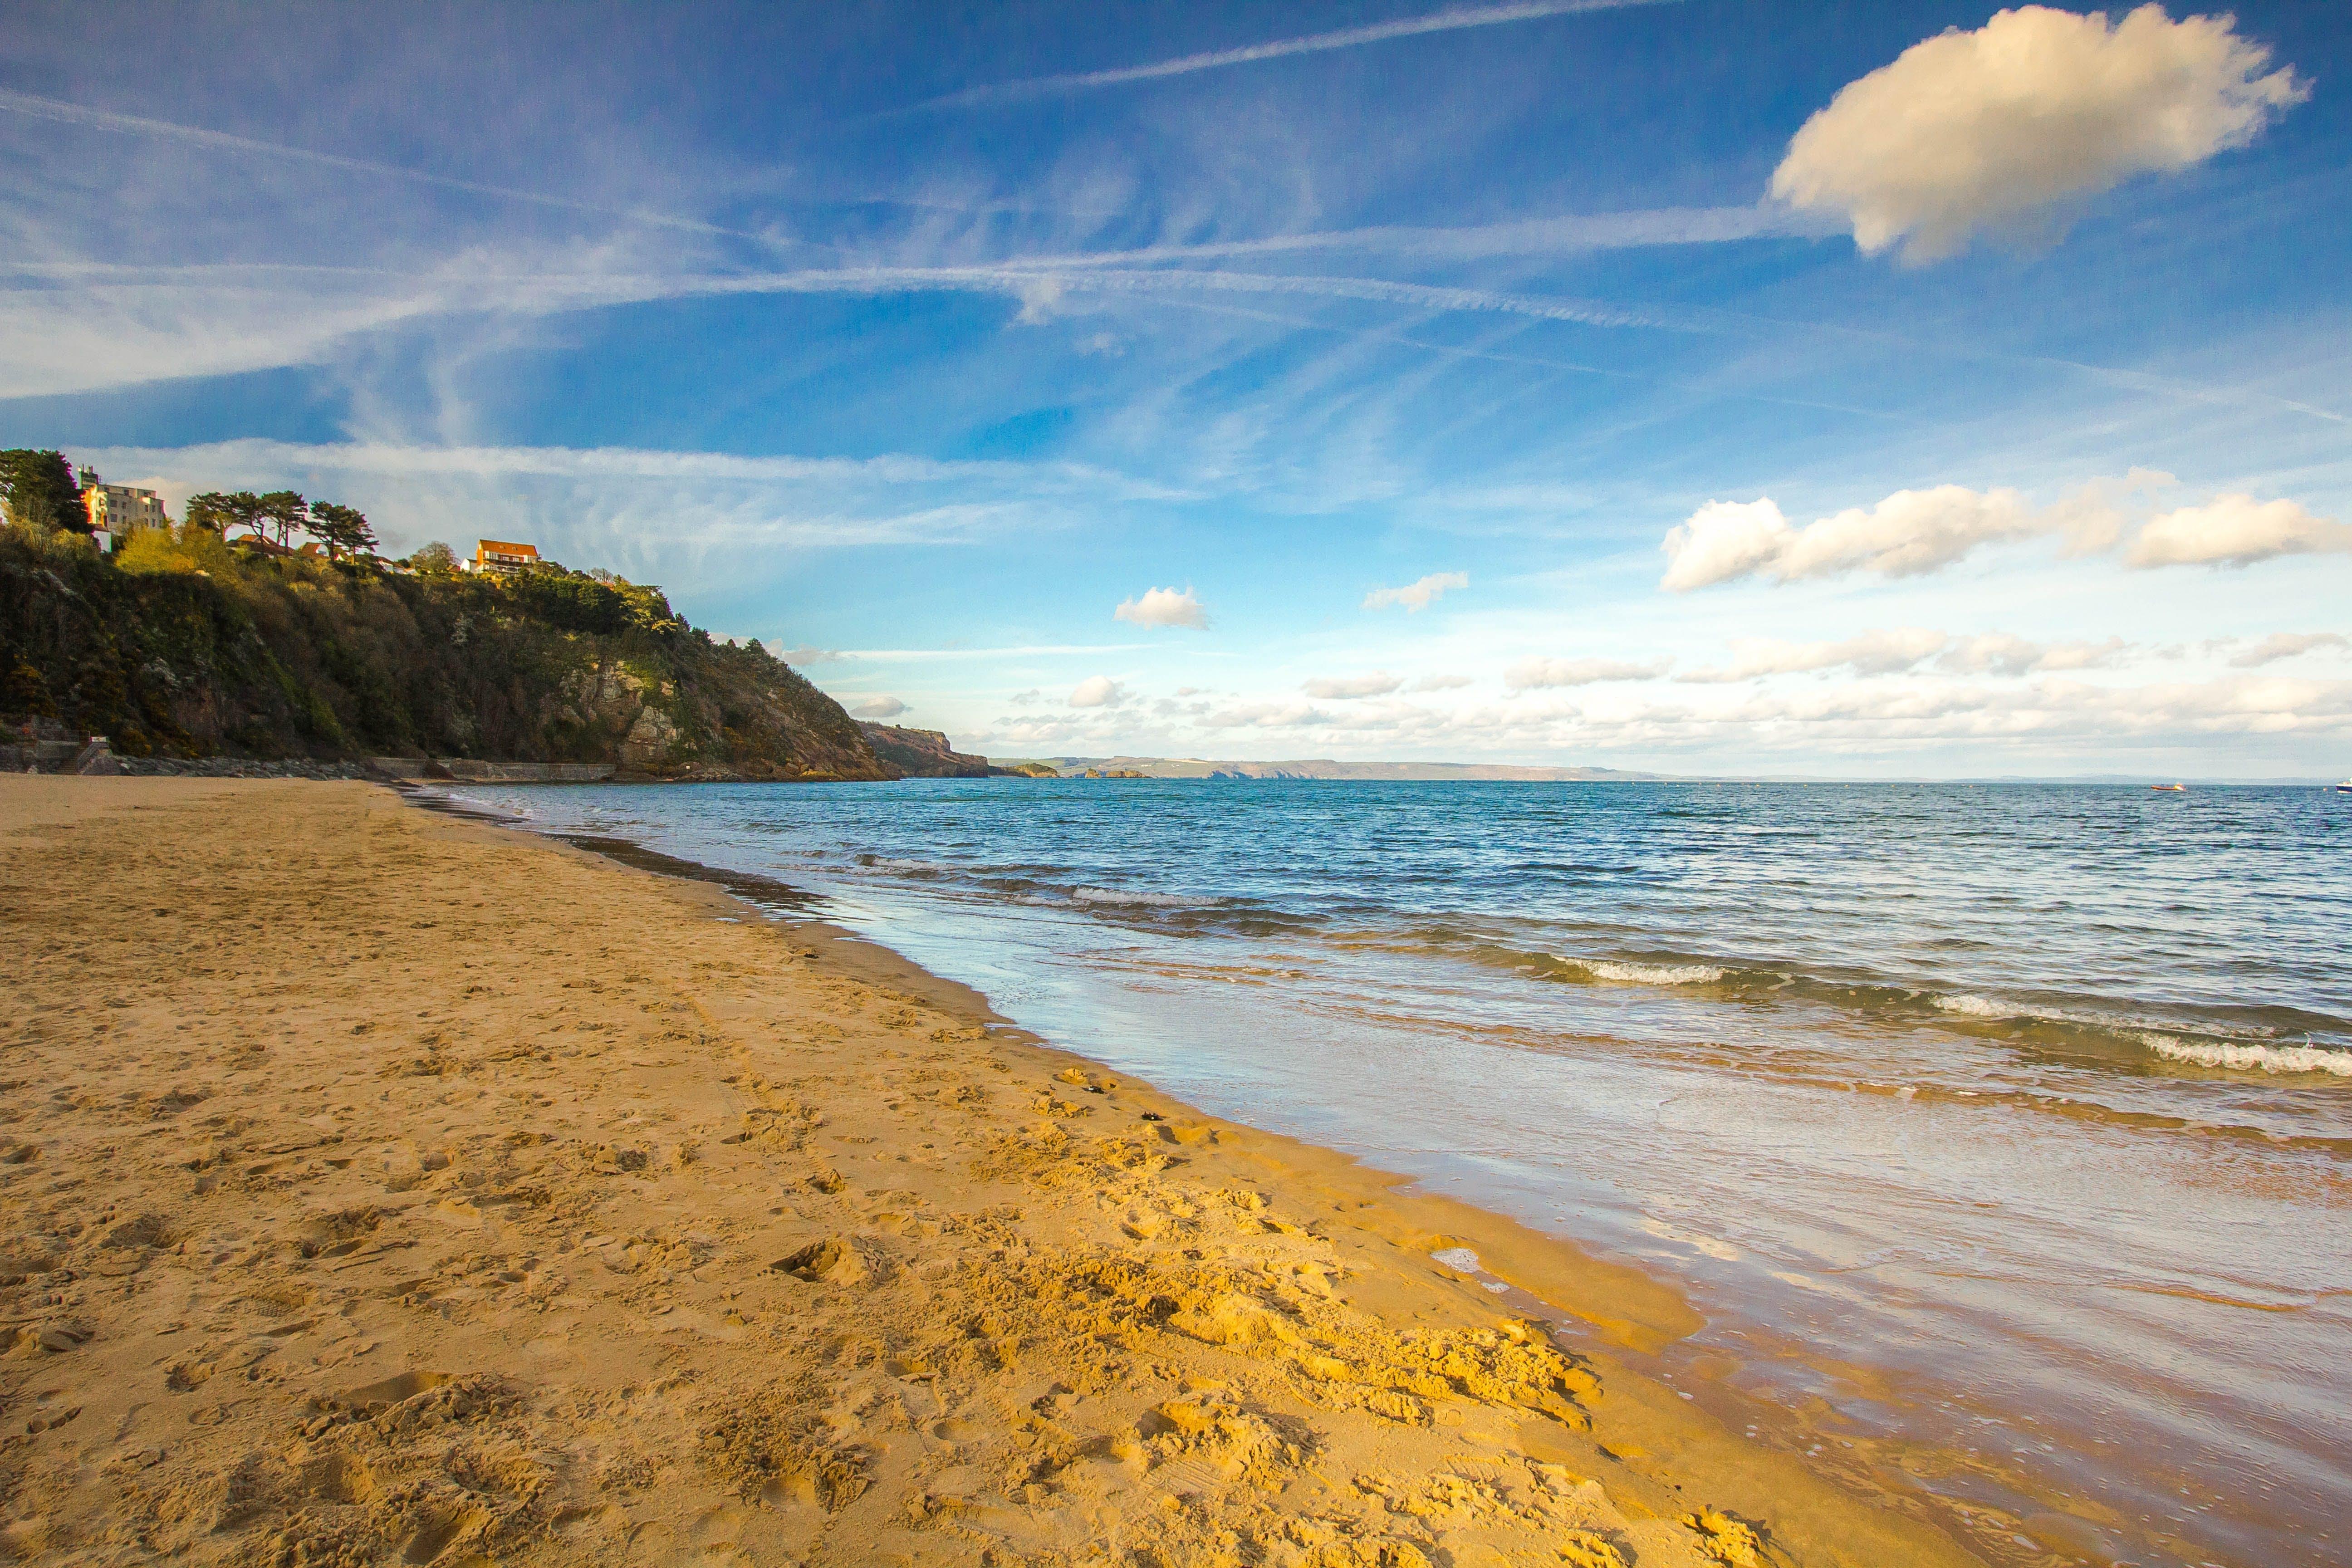 Seashore Under Blue Sky